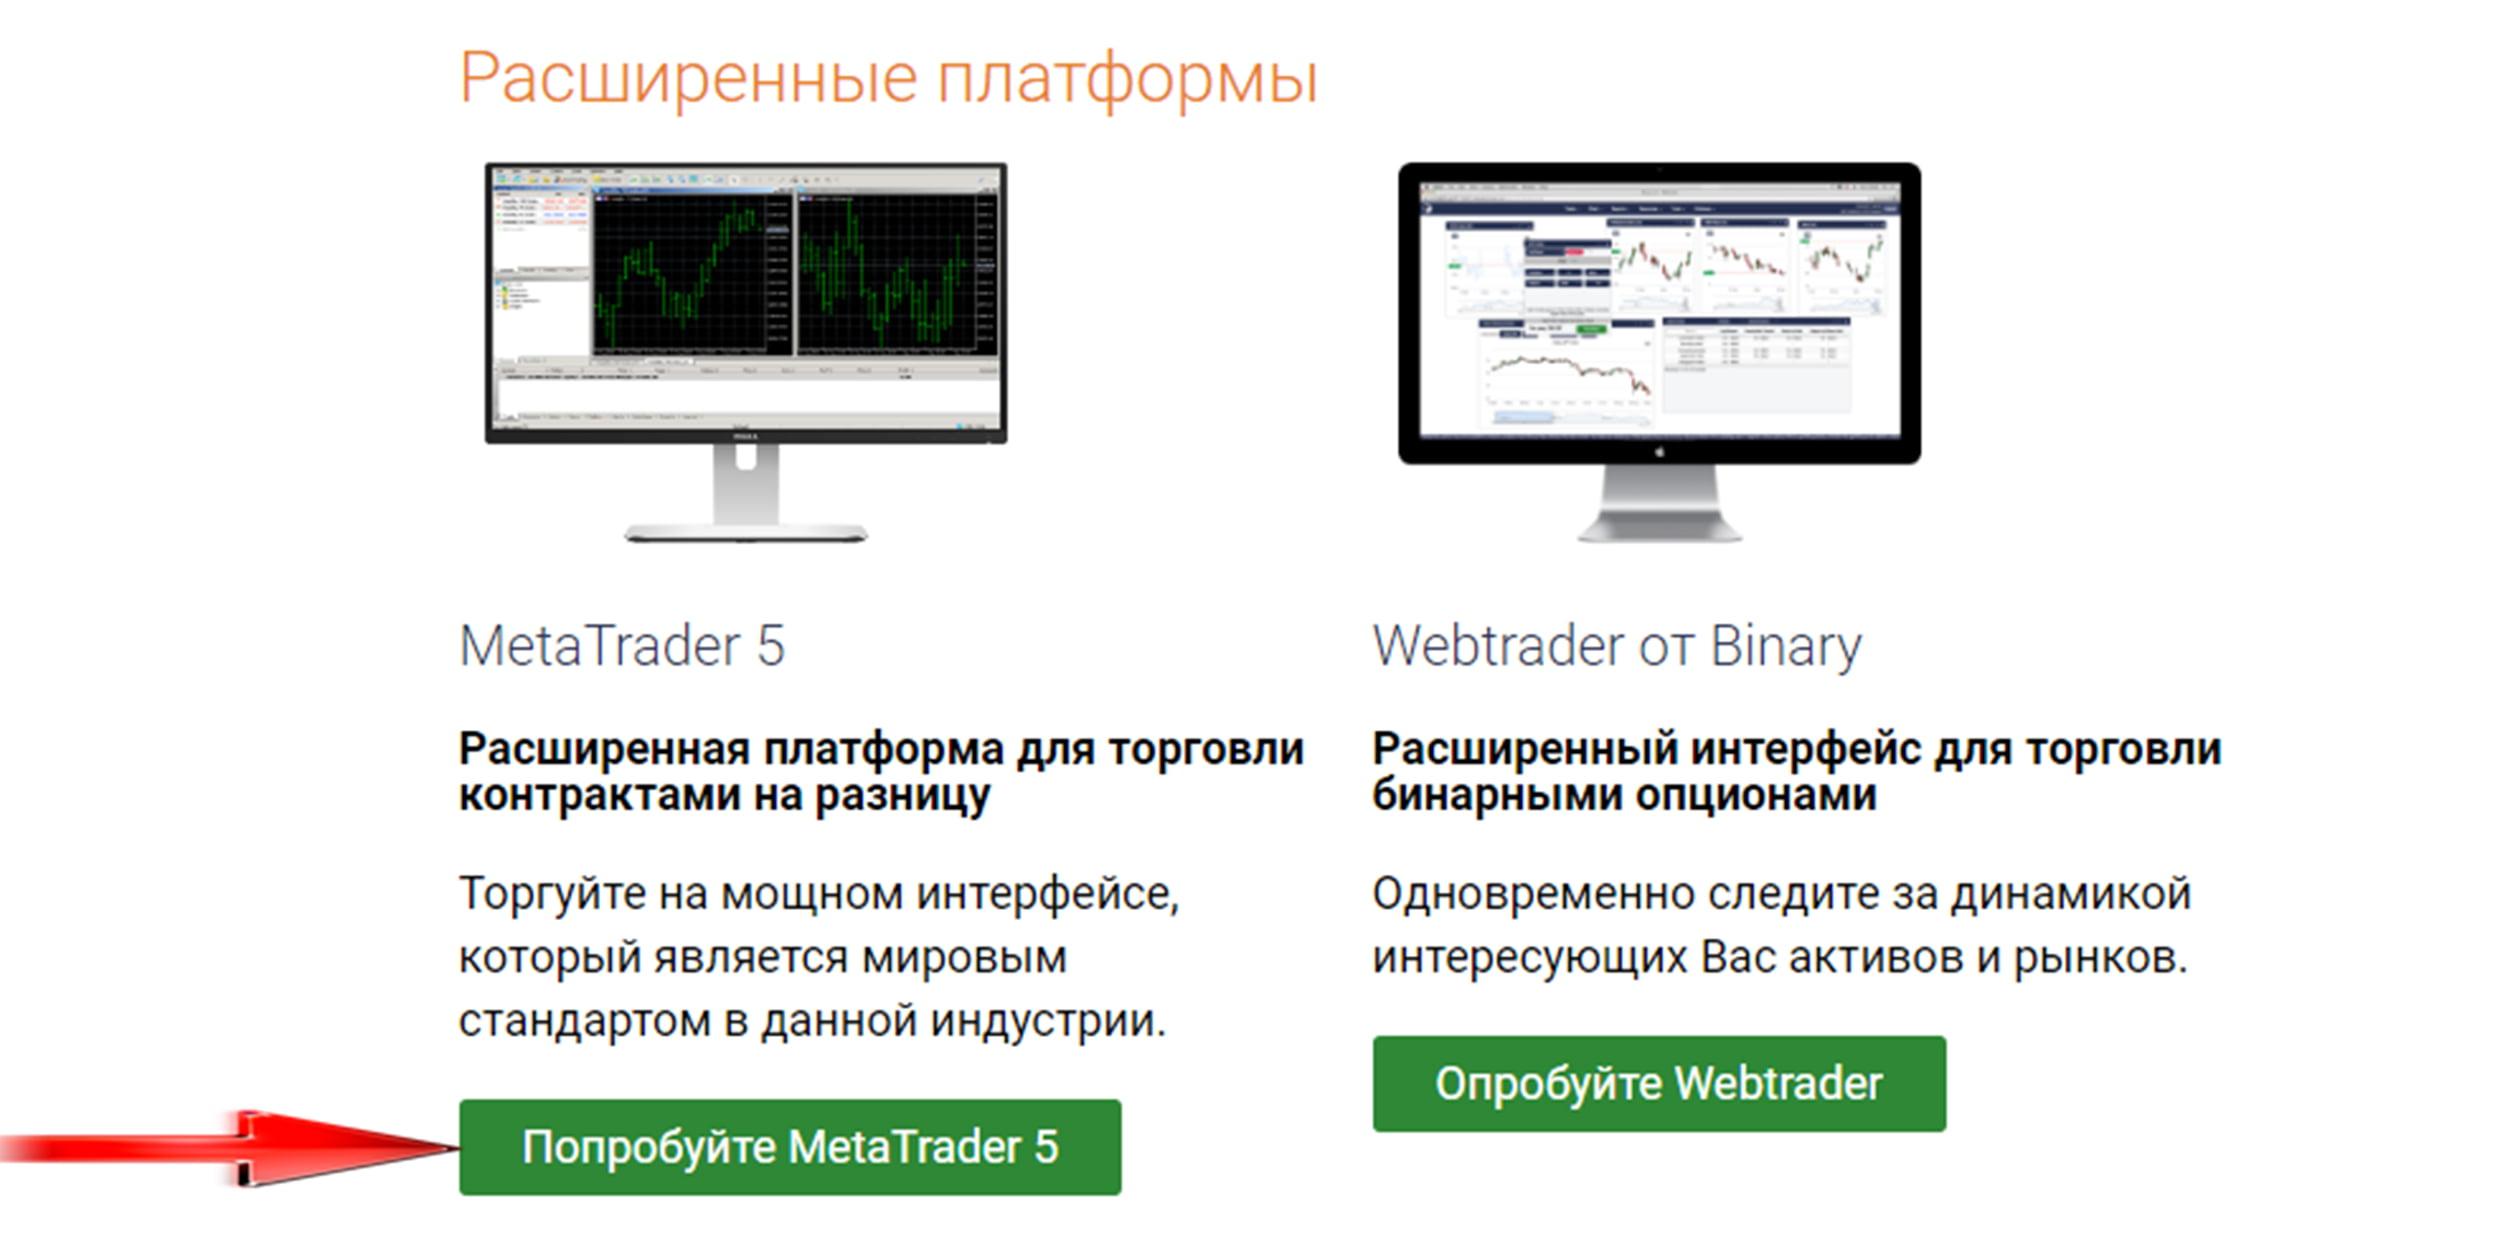 Настройка терминала МТ5 на платформе брокера Binary.com